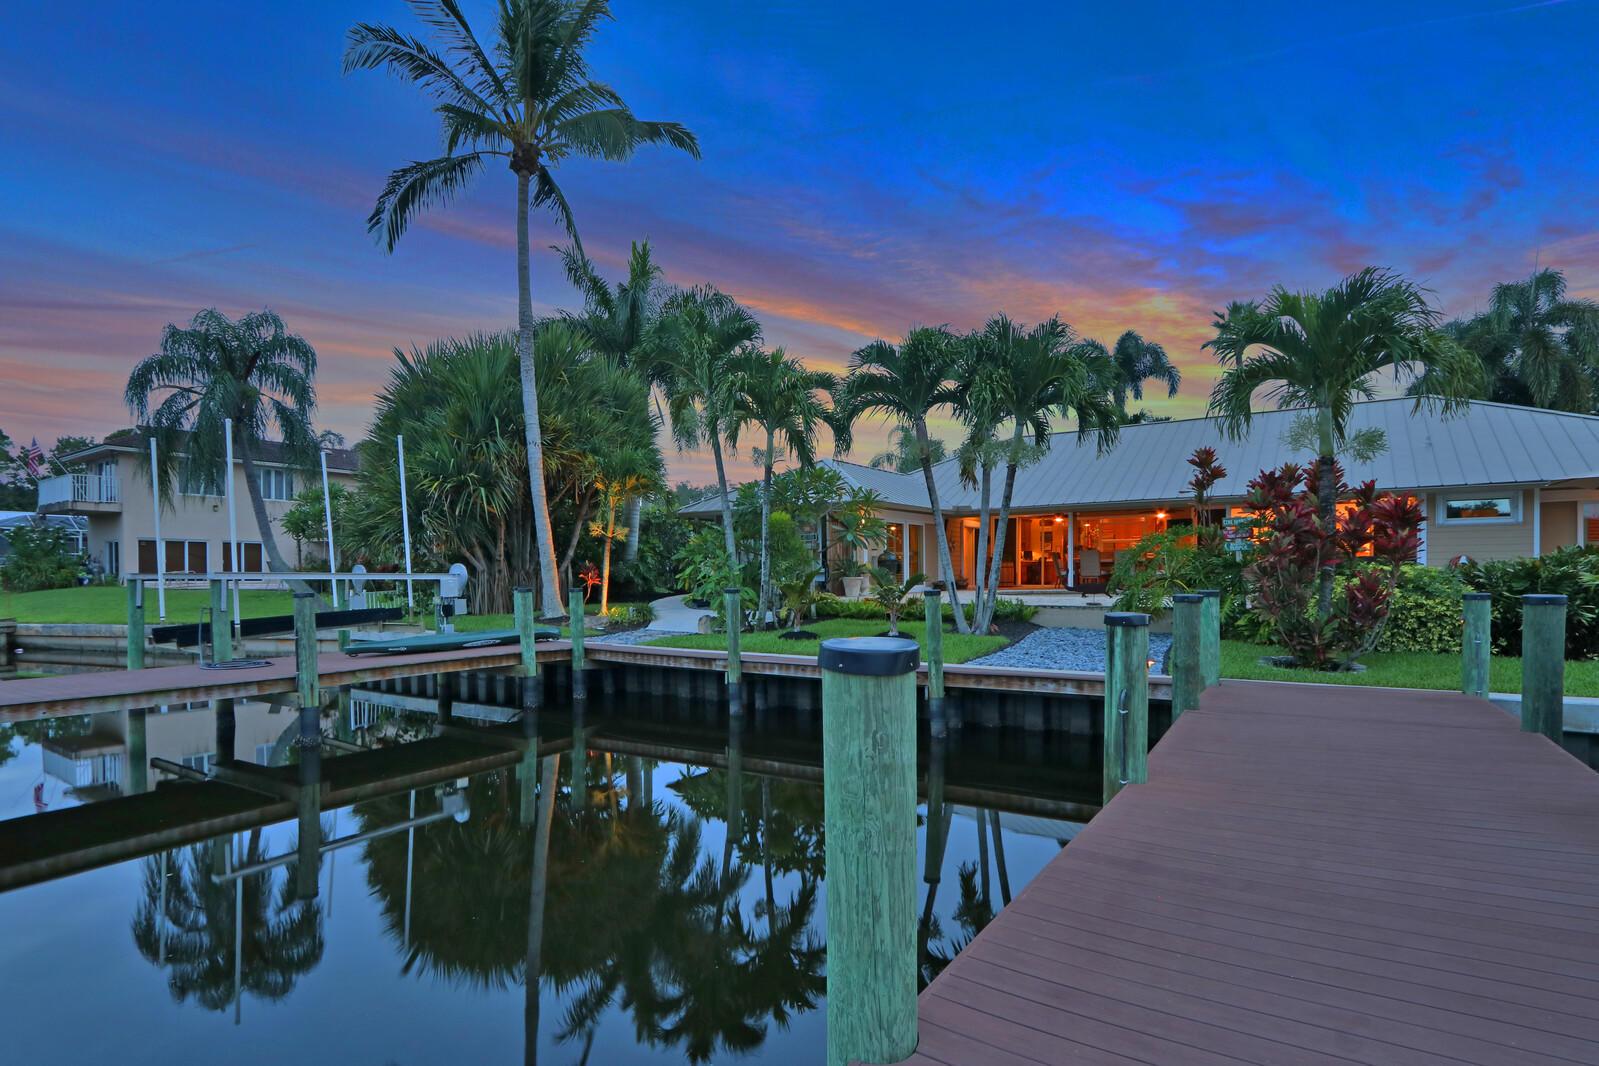 731 Pine Tree, Palm City, Florida 34990